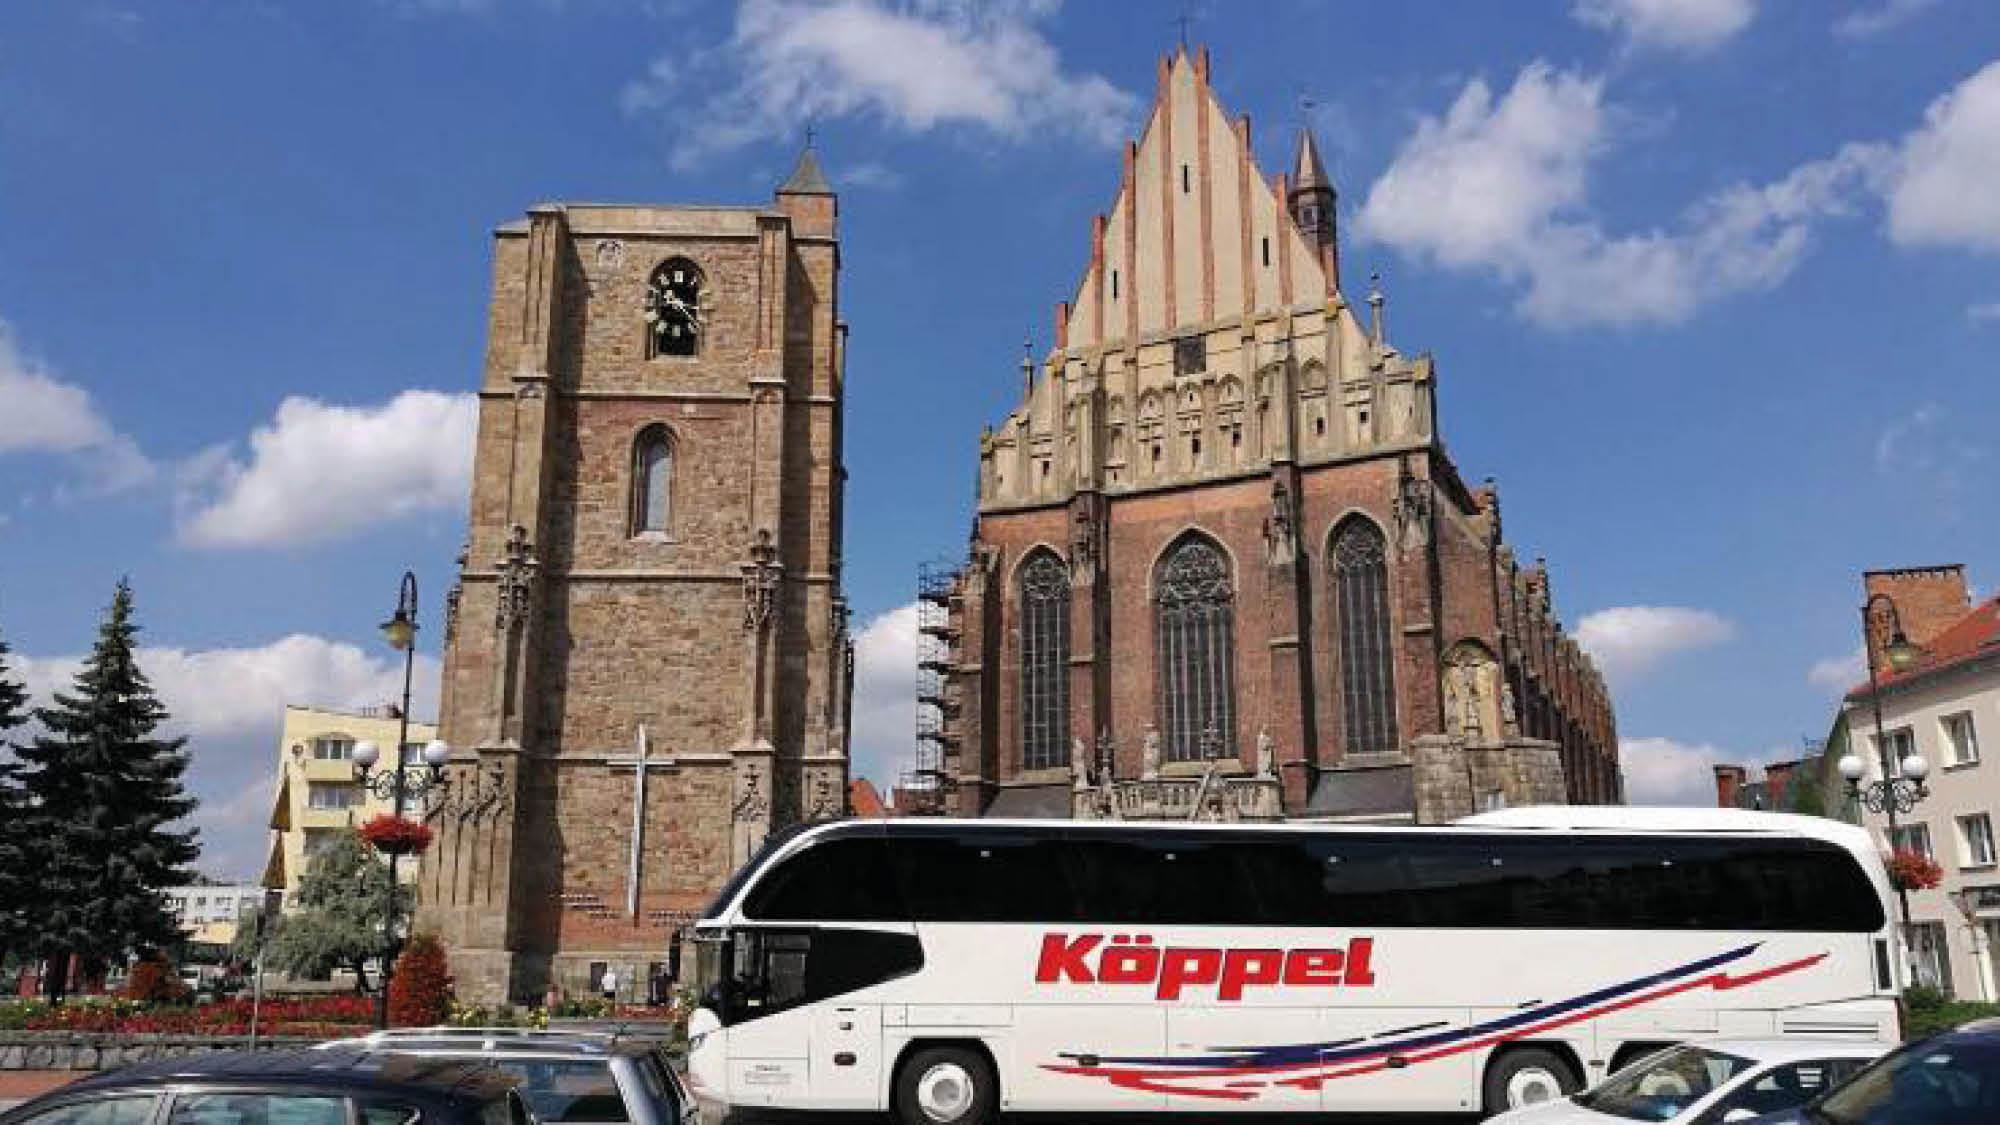 Köppel - Ellwangen - Website - Bus - 2019-12 - 06